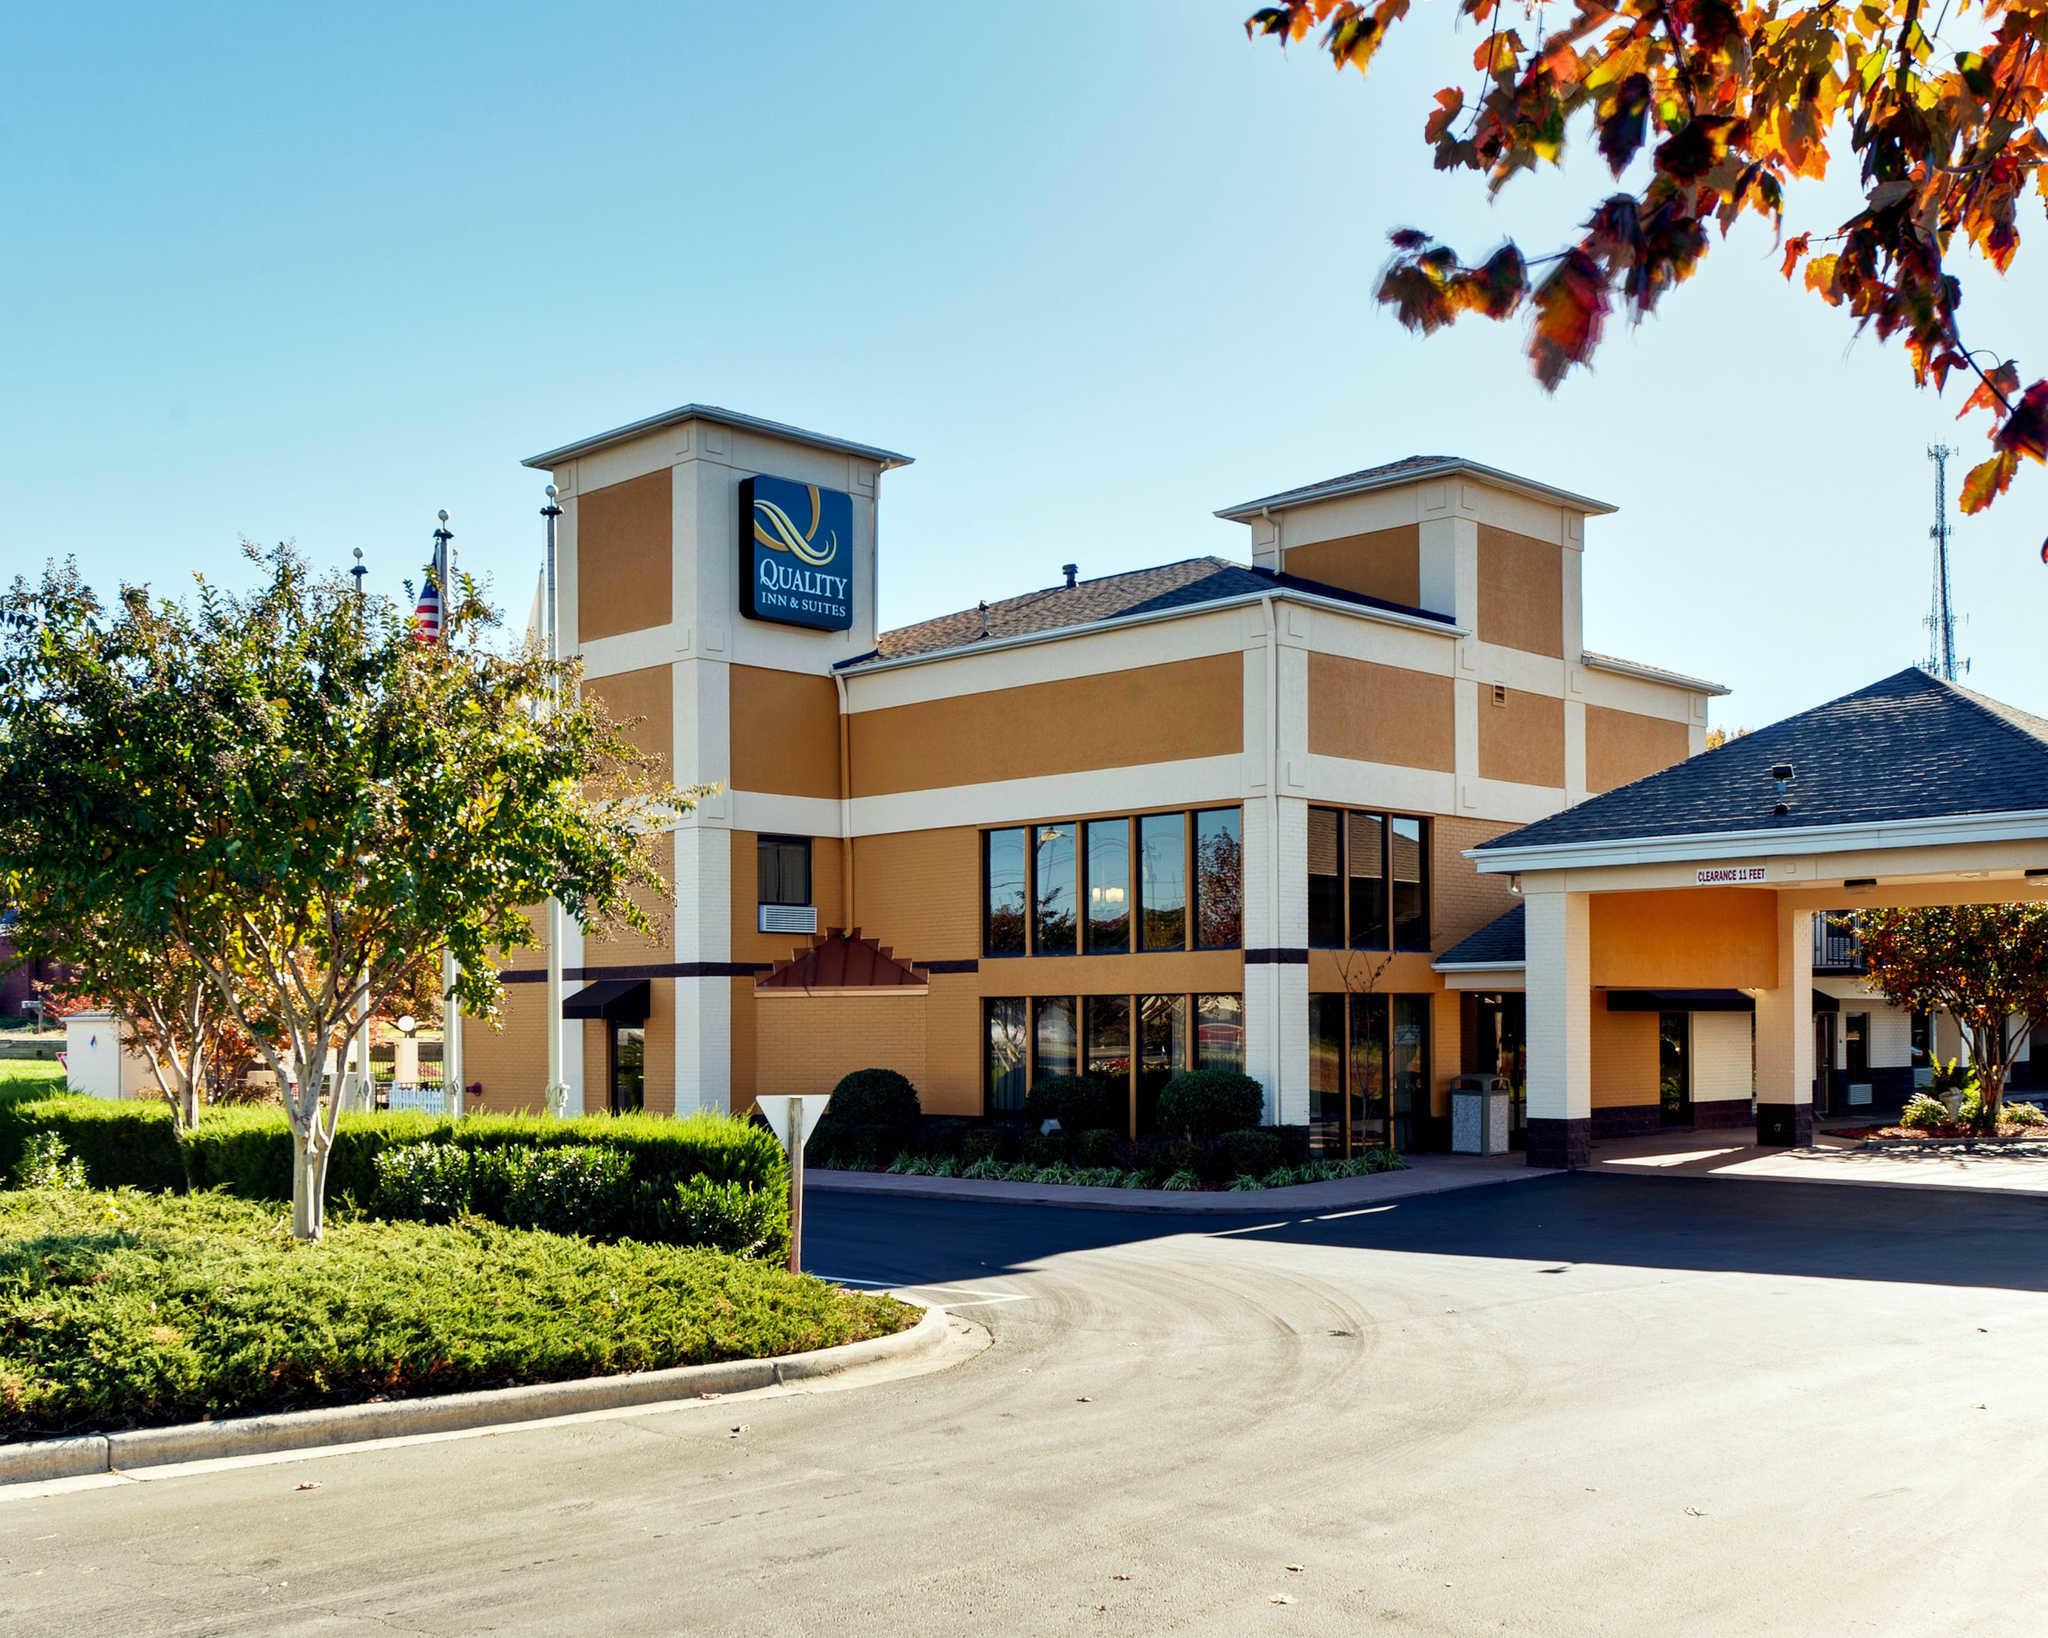 Quality Inn & Suites Matthews - Charlotte image 0